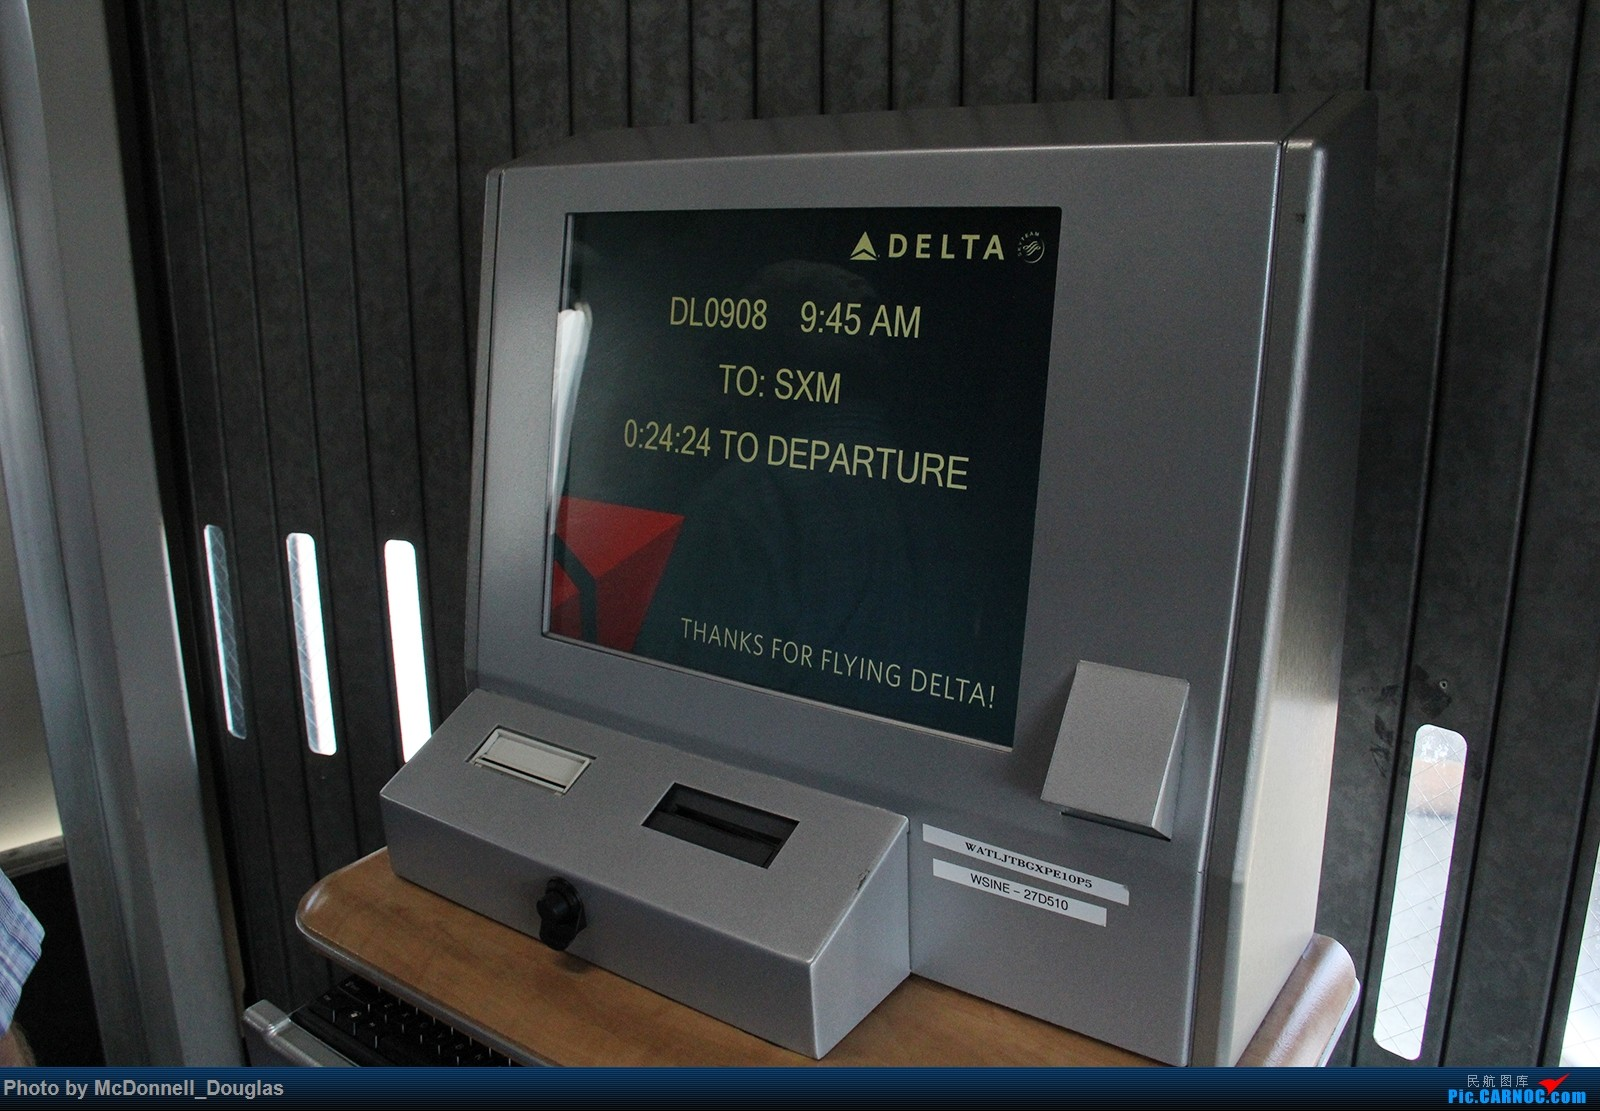 Re:[原创]【上海飞友会】图会很多,也有很多驾驶舱,杂七杂八的美帝,梦寐以求的圣马丁,这更绝不弃贴【驾驶舱已出现】【已更新至圣马丁部分】 BOEING757-232 N670DN 美国亚特兰大哈兹菲尔德-杰克逊国际机场